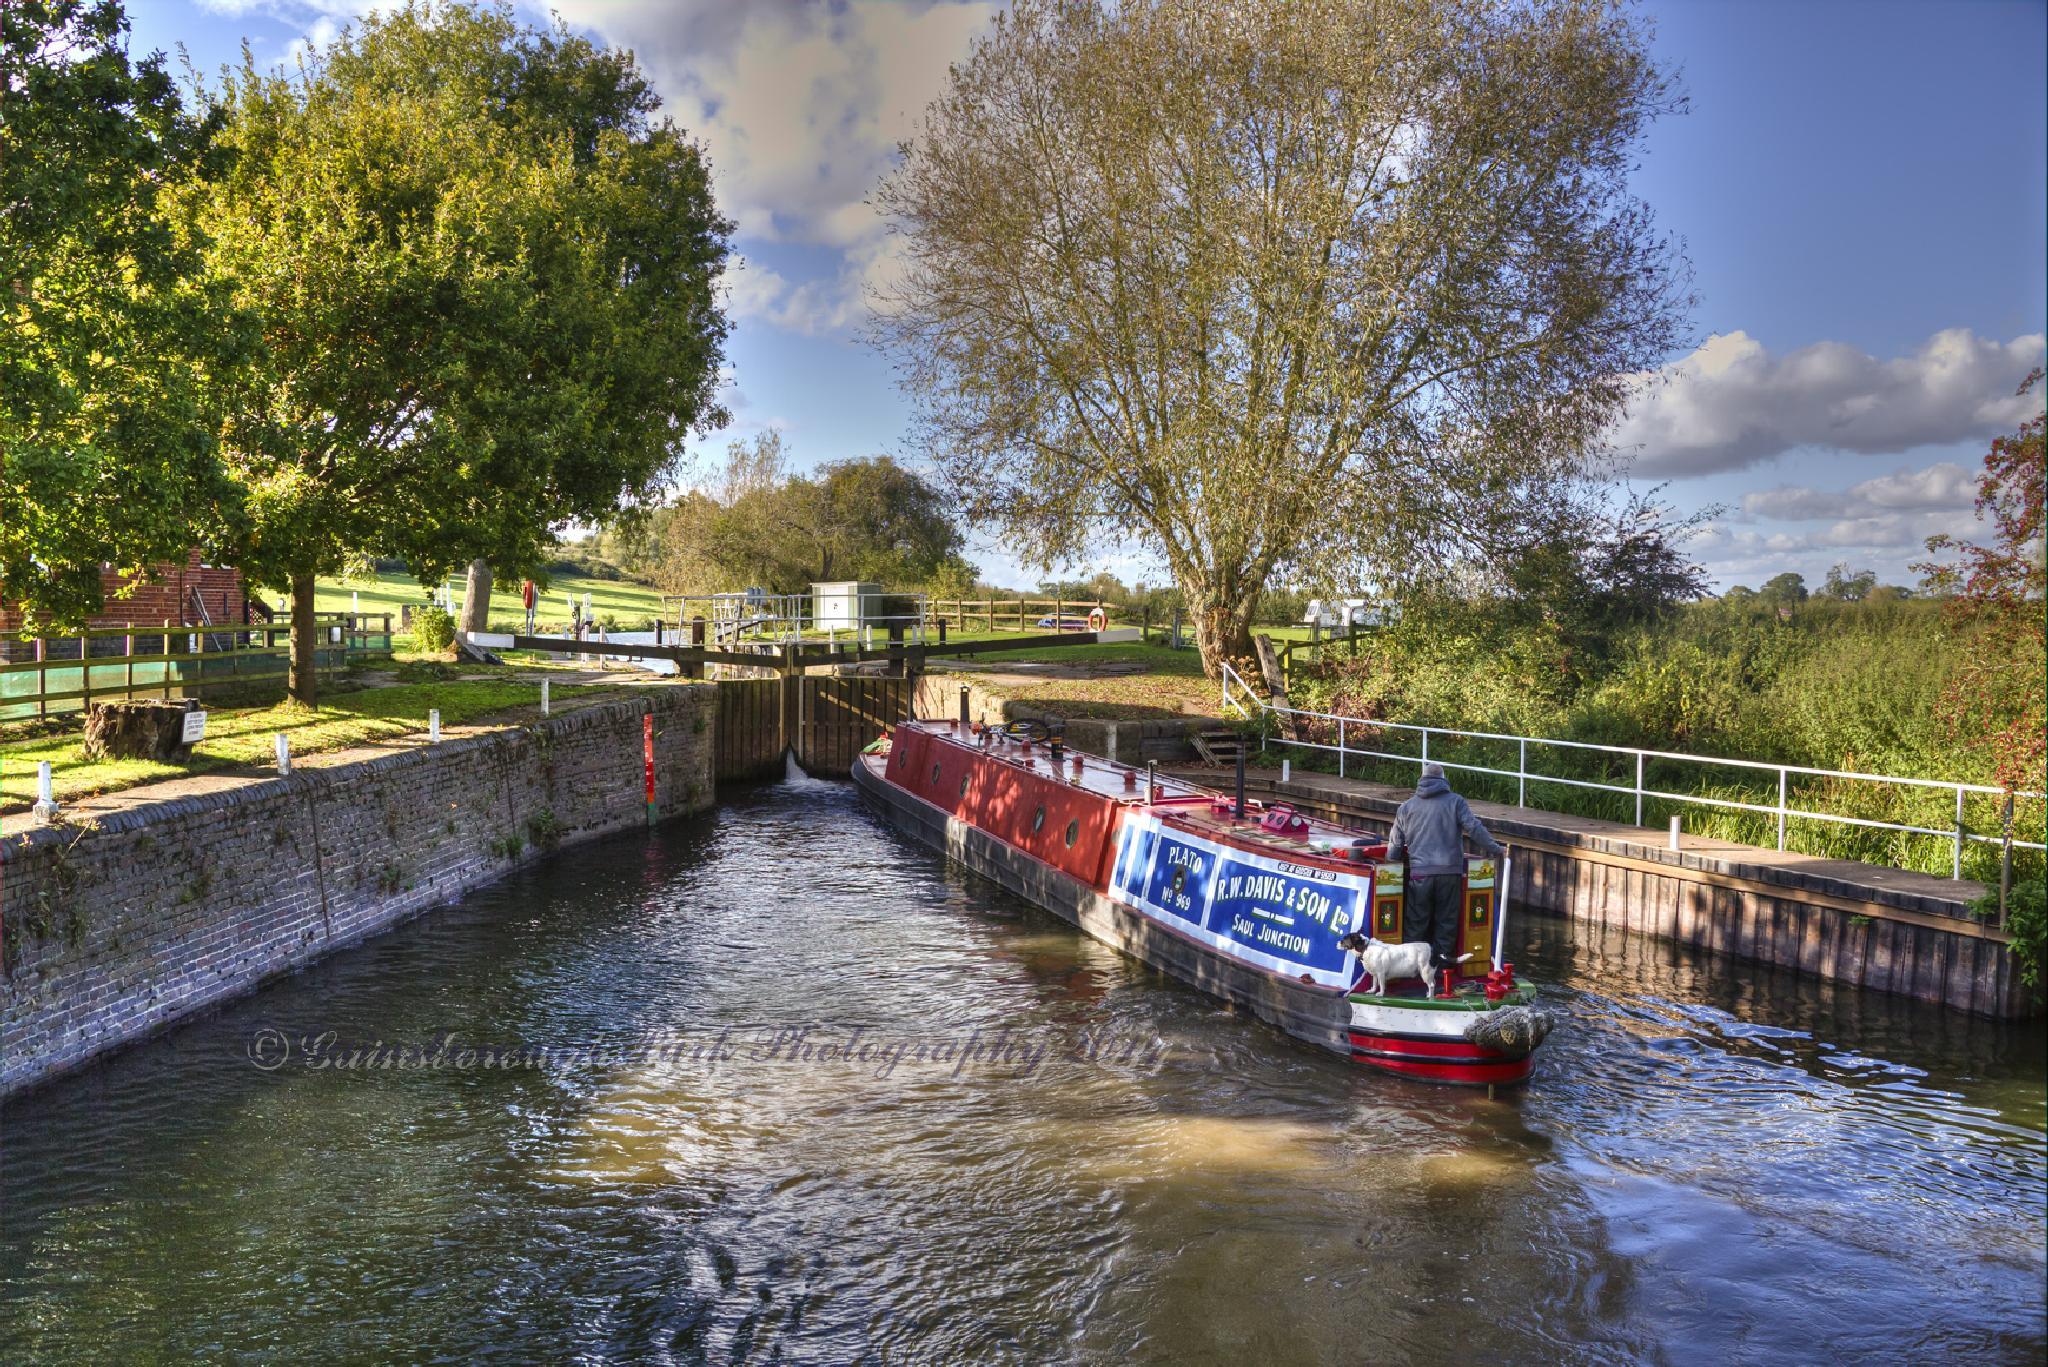 River Avon by Gainsborough Park Photography